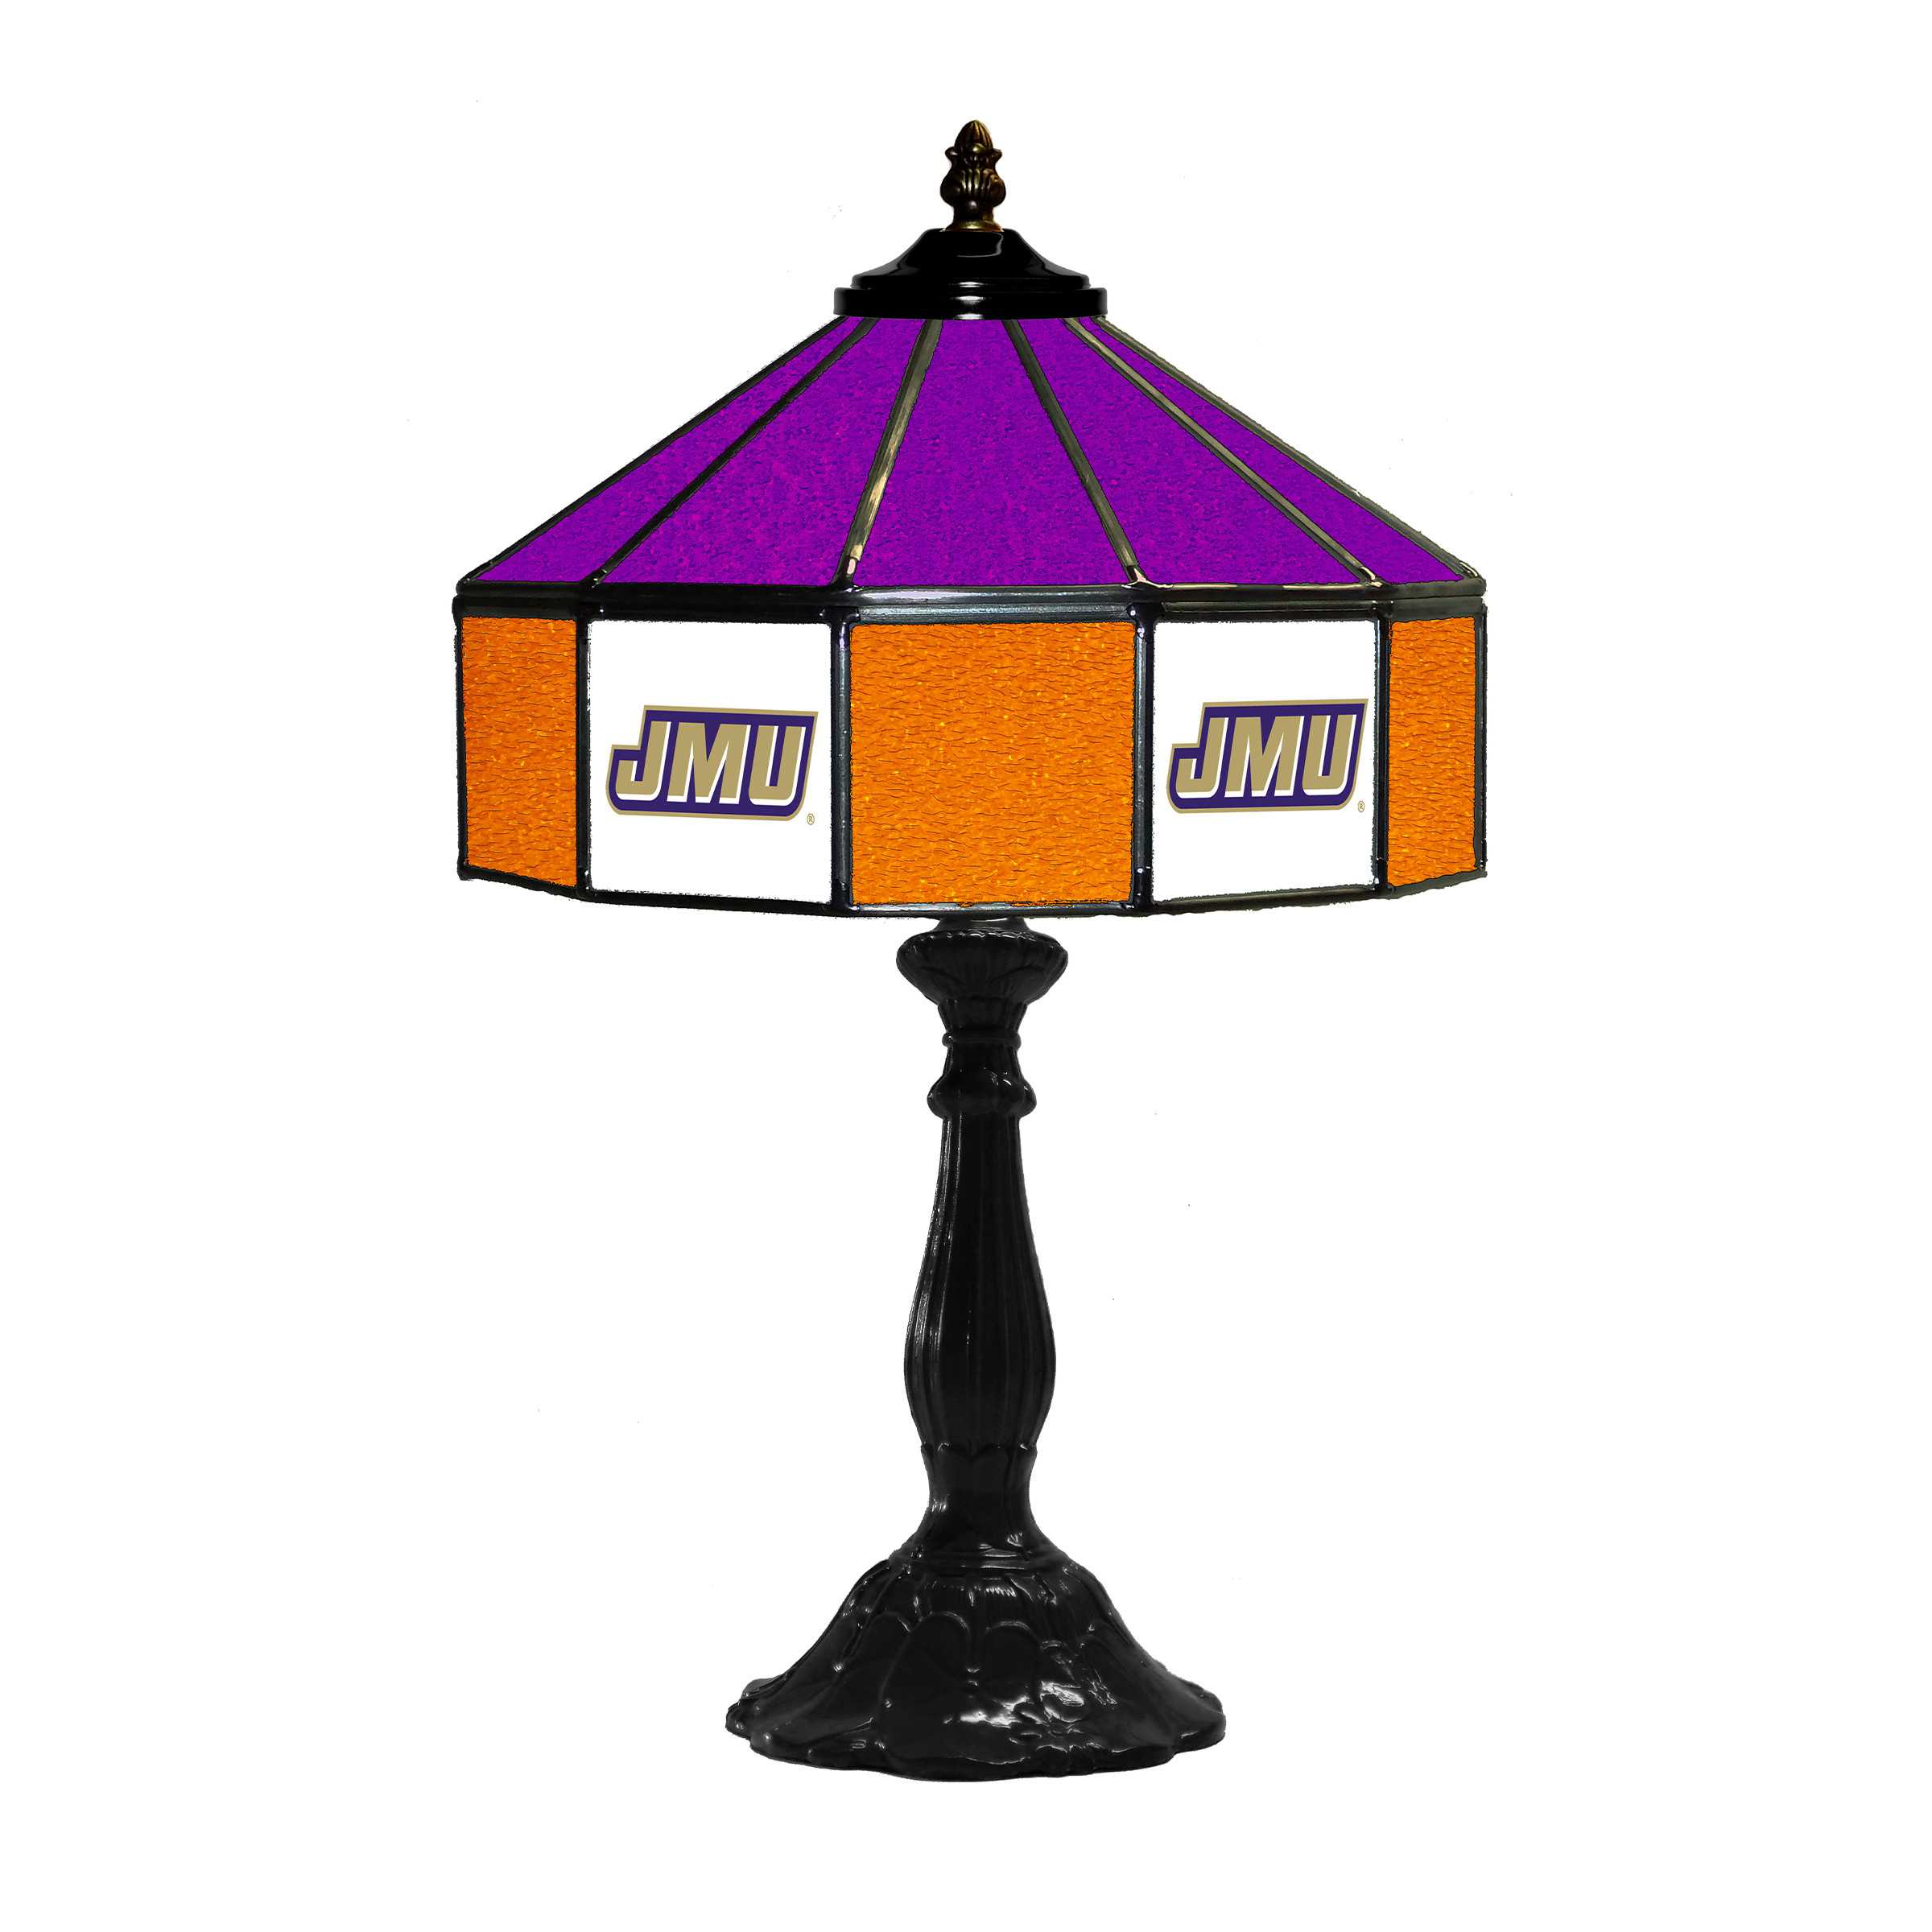 "JAMES MADISON UNIVERSITY 21"" GLASS TABLE LAMP"